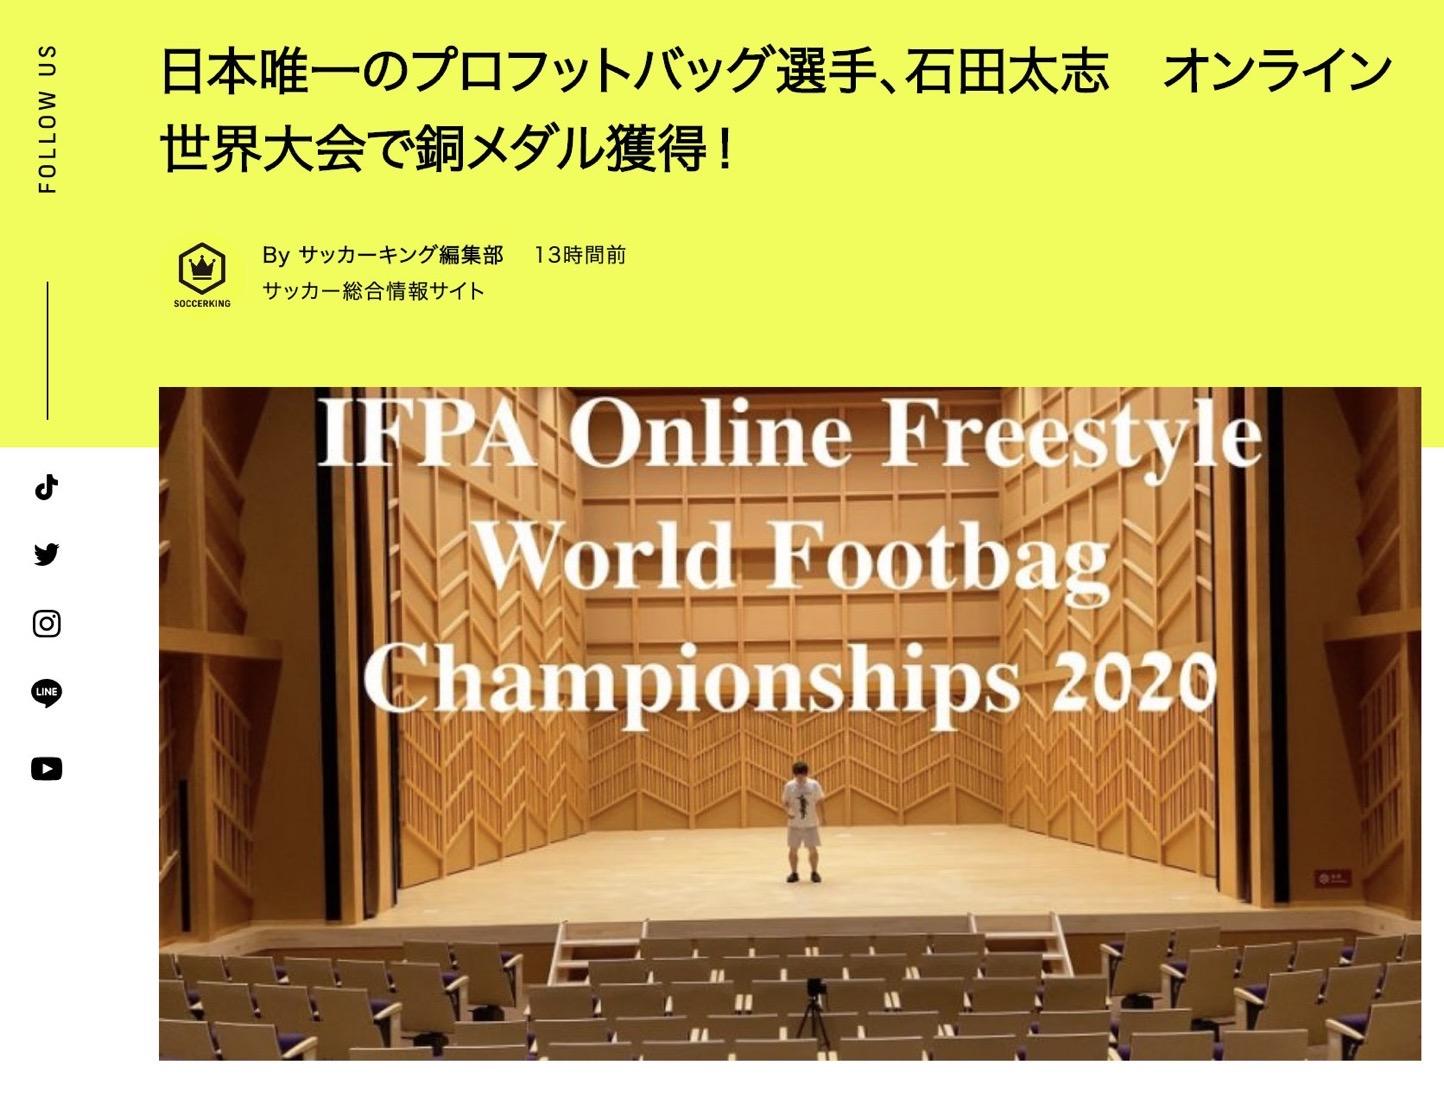 Taishiishida 2020 Aug 13